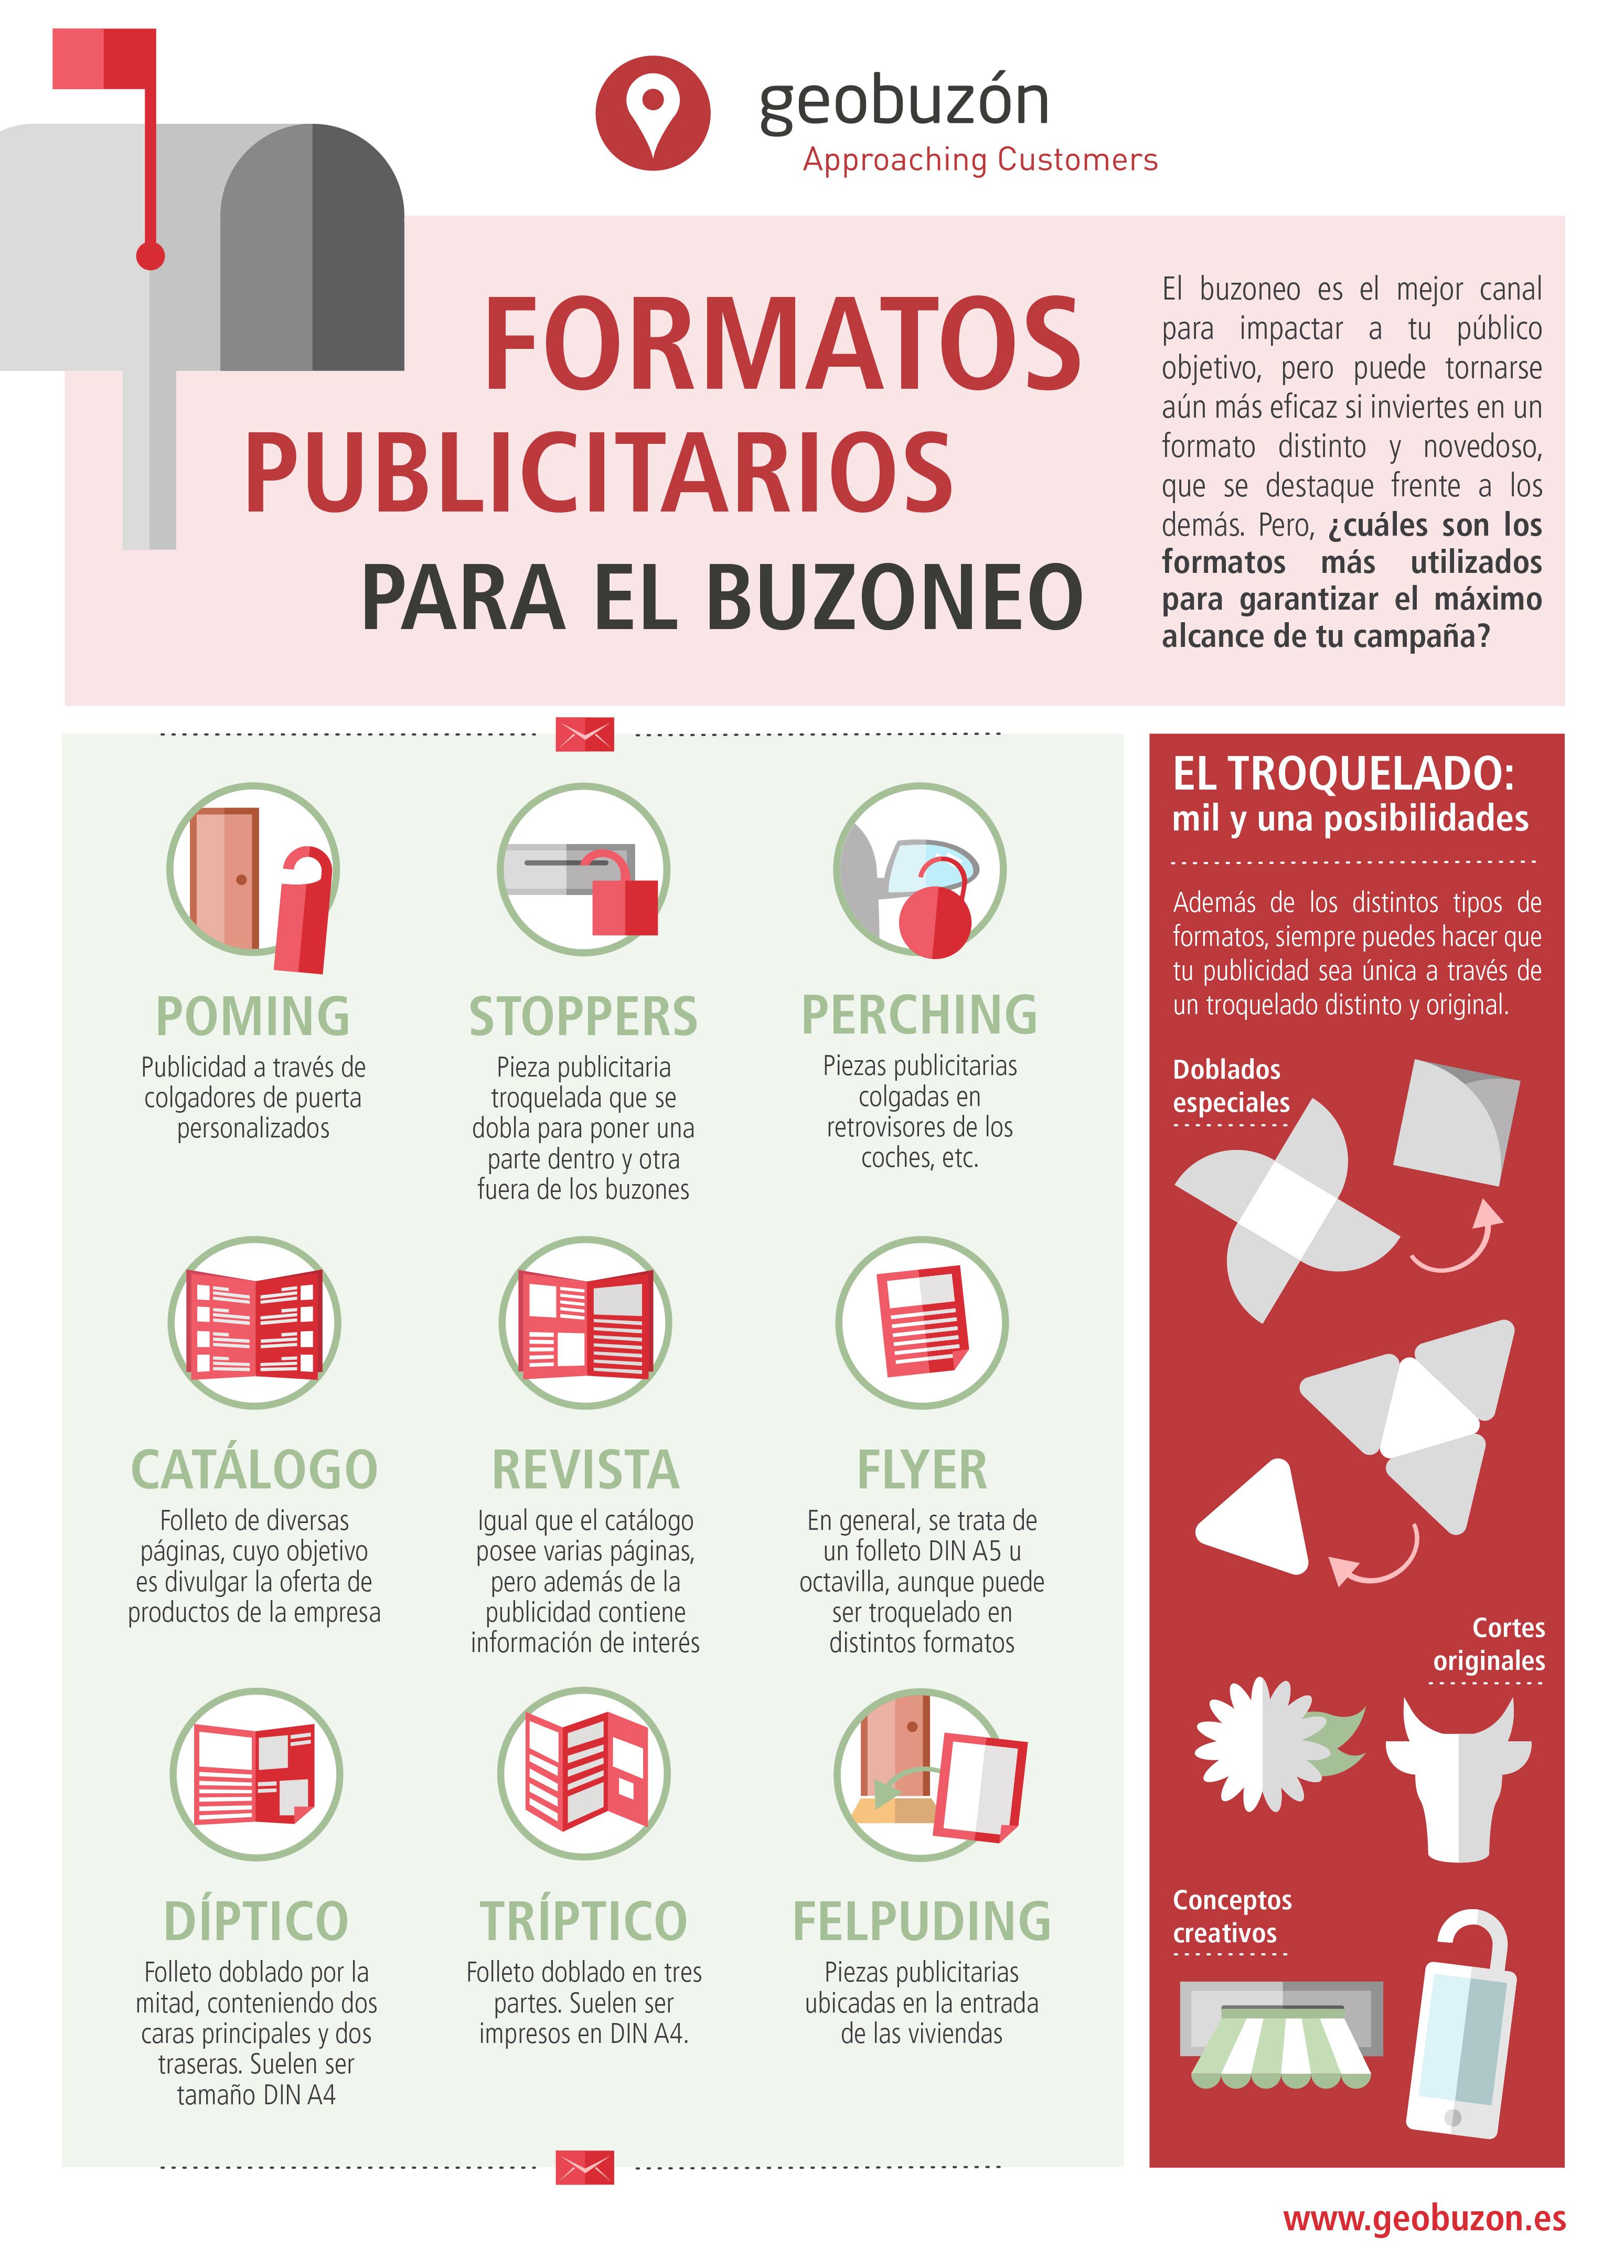 Formatos publicitarios para el buzoneo #infografia #infographic #marketing